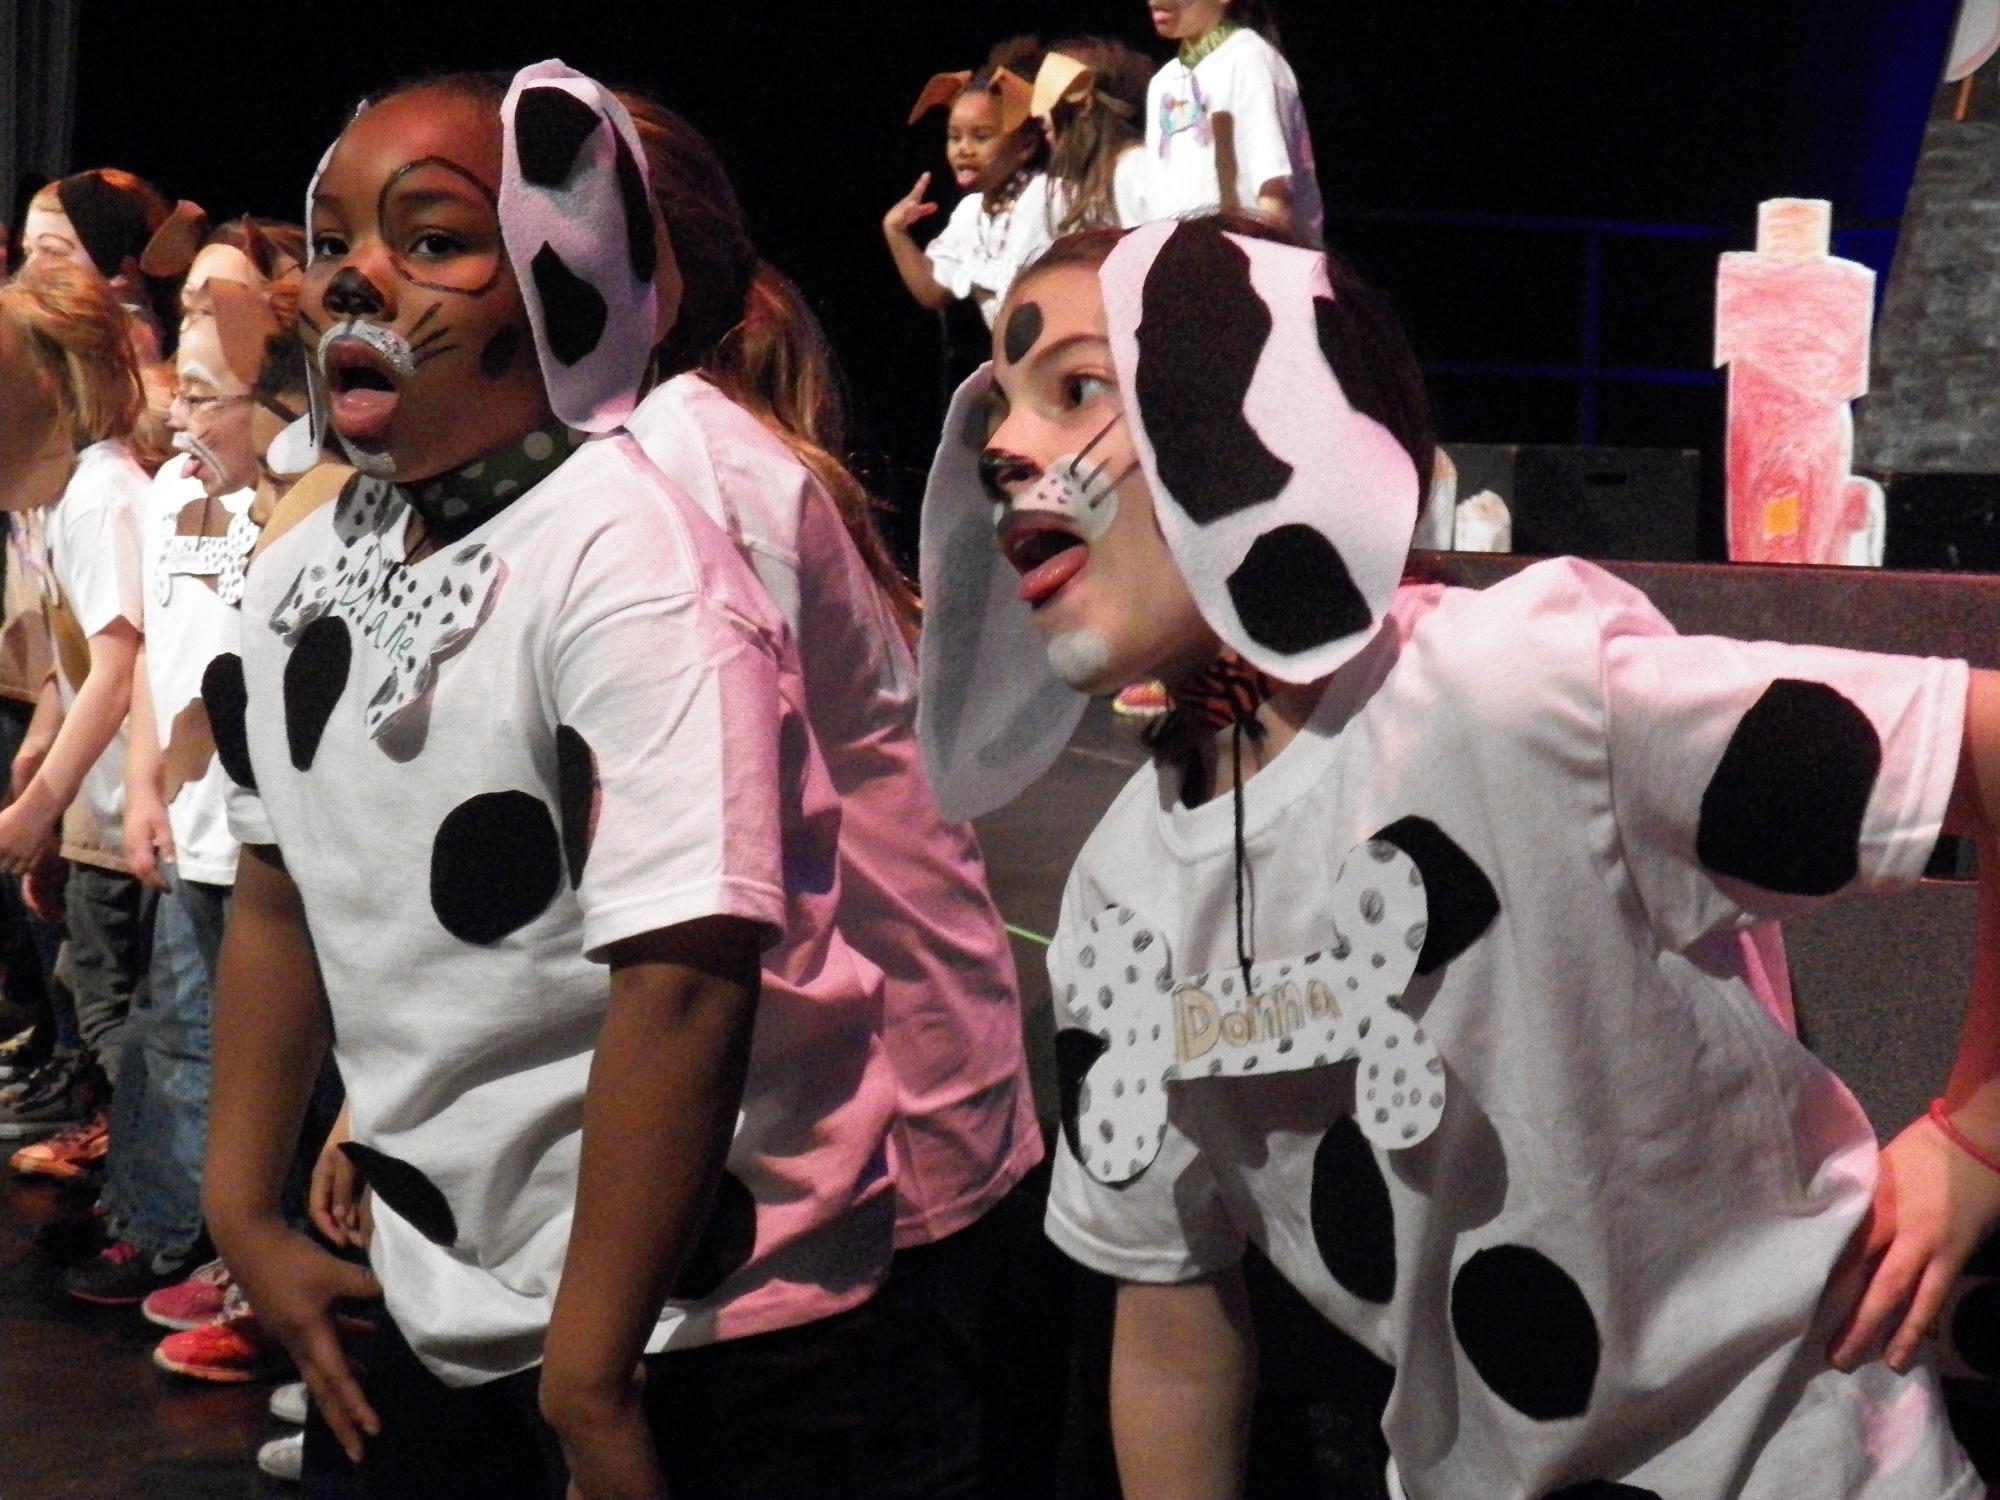 Starlight Theatre Offers Spring Break Options for Grades 1-12